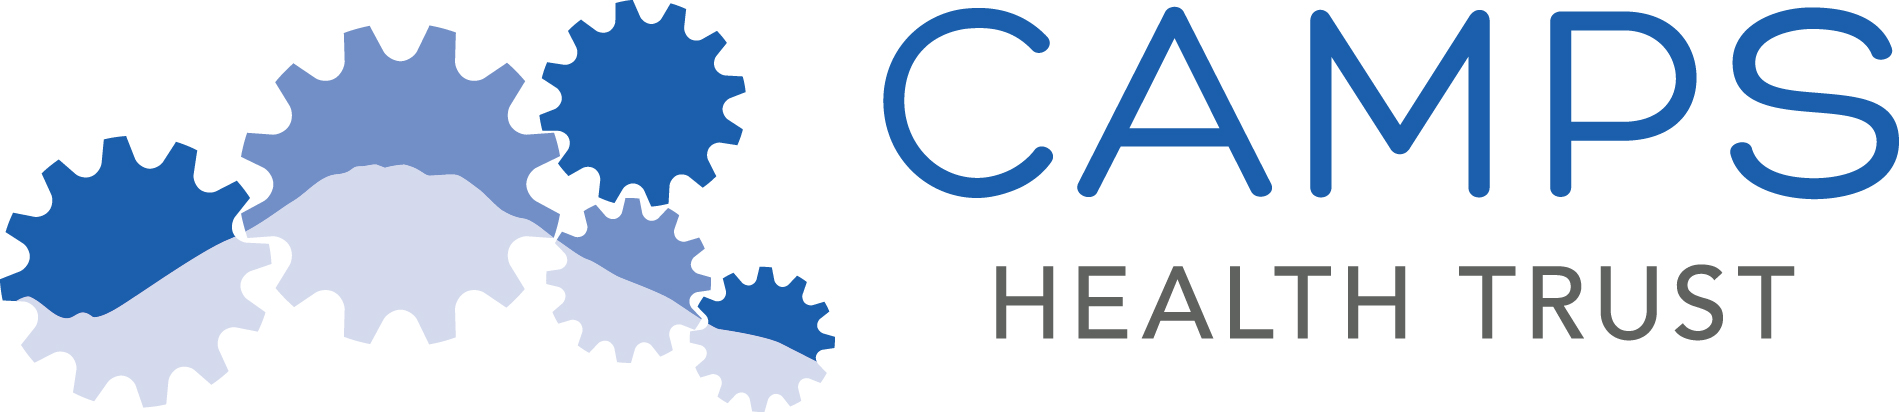 camps logo.jpg